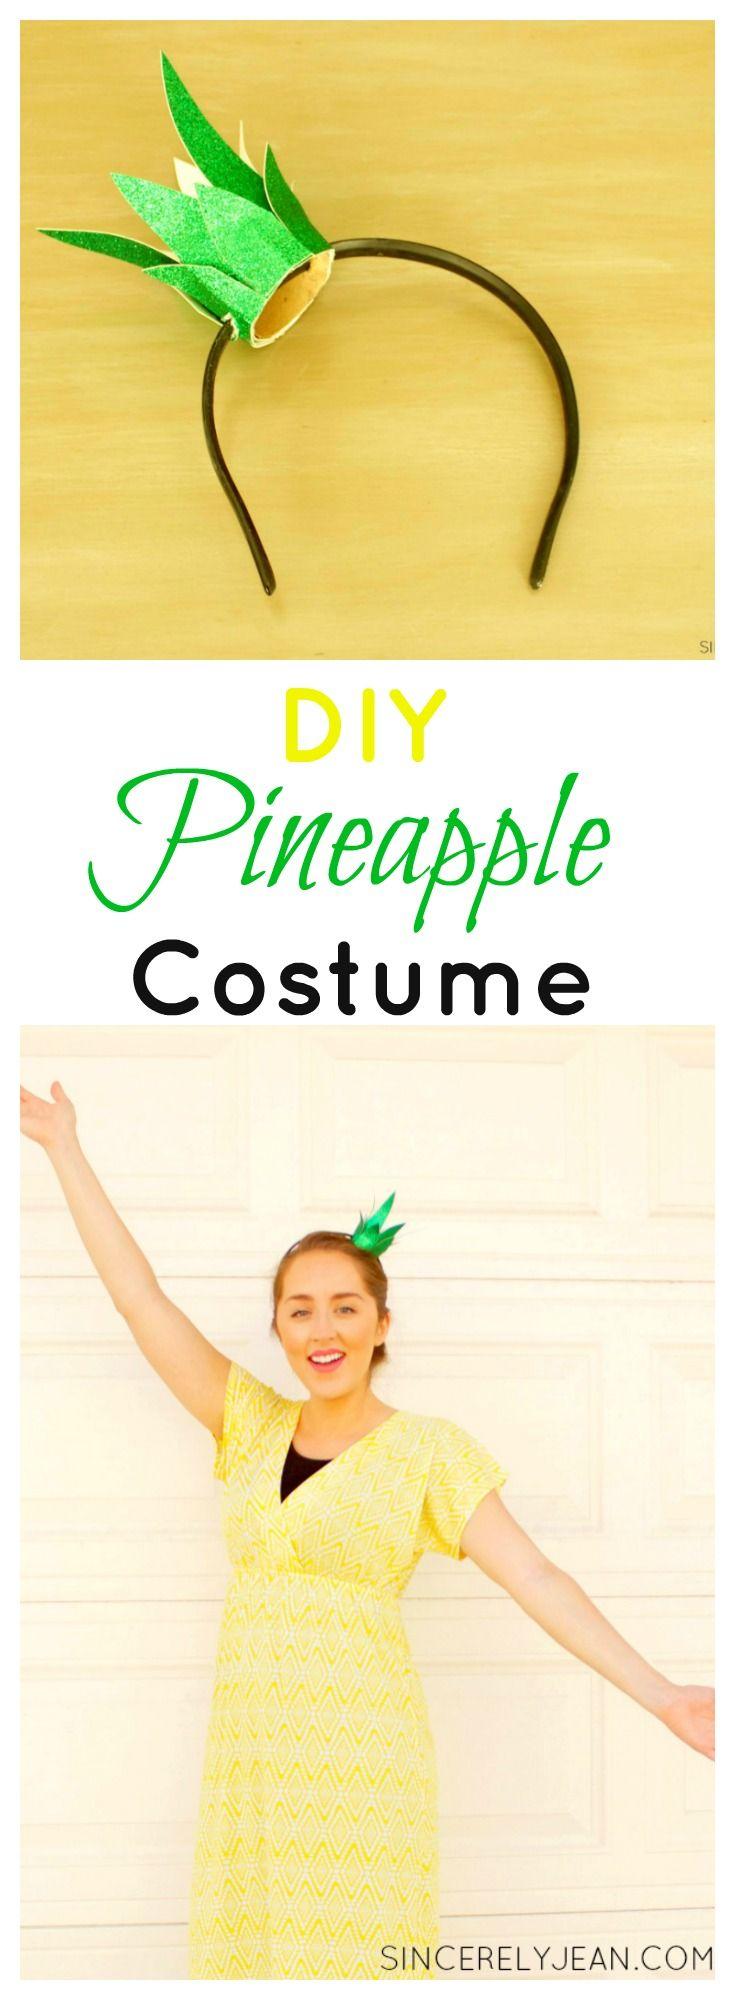 DIY Pineapple Costume /Headband Tutorial - SincerelyJean.com: Three Sisters…